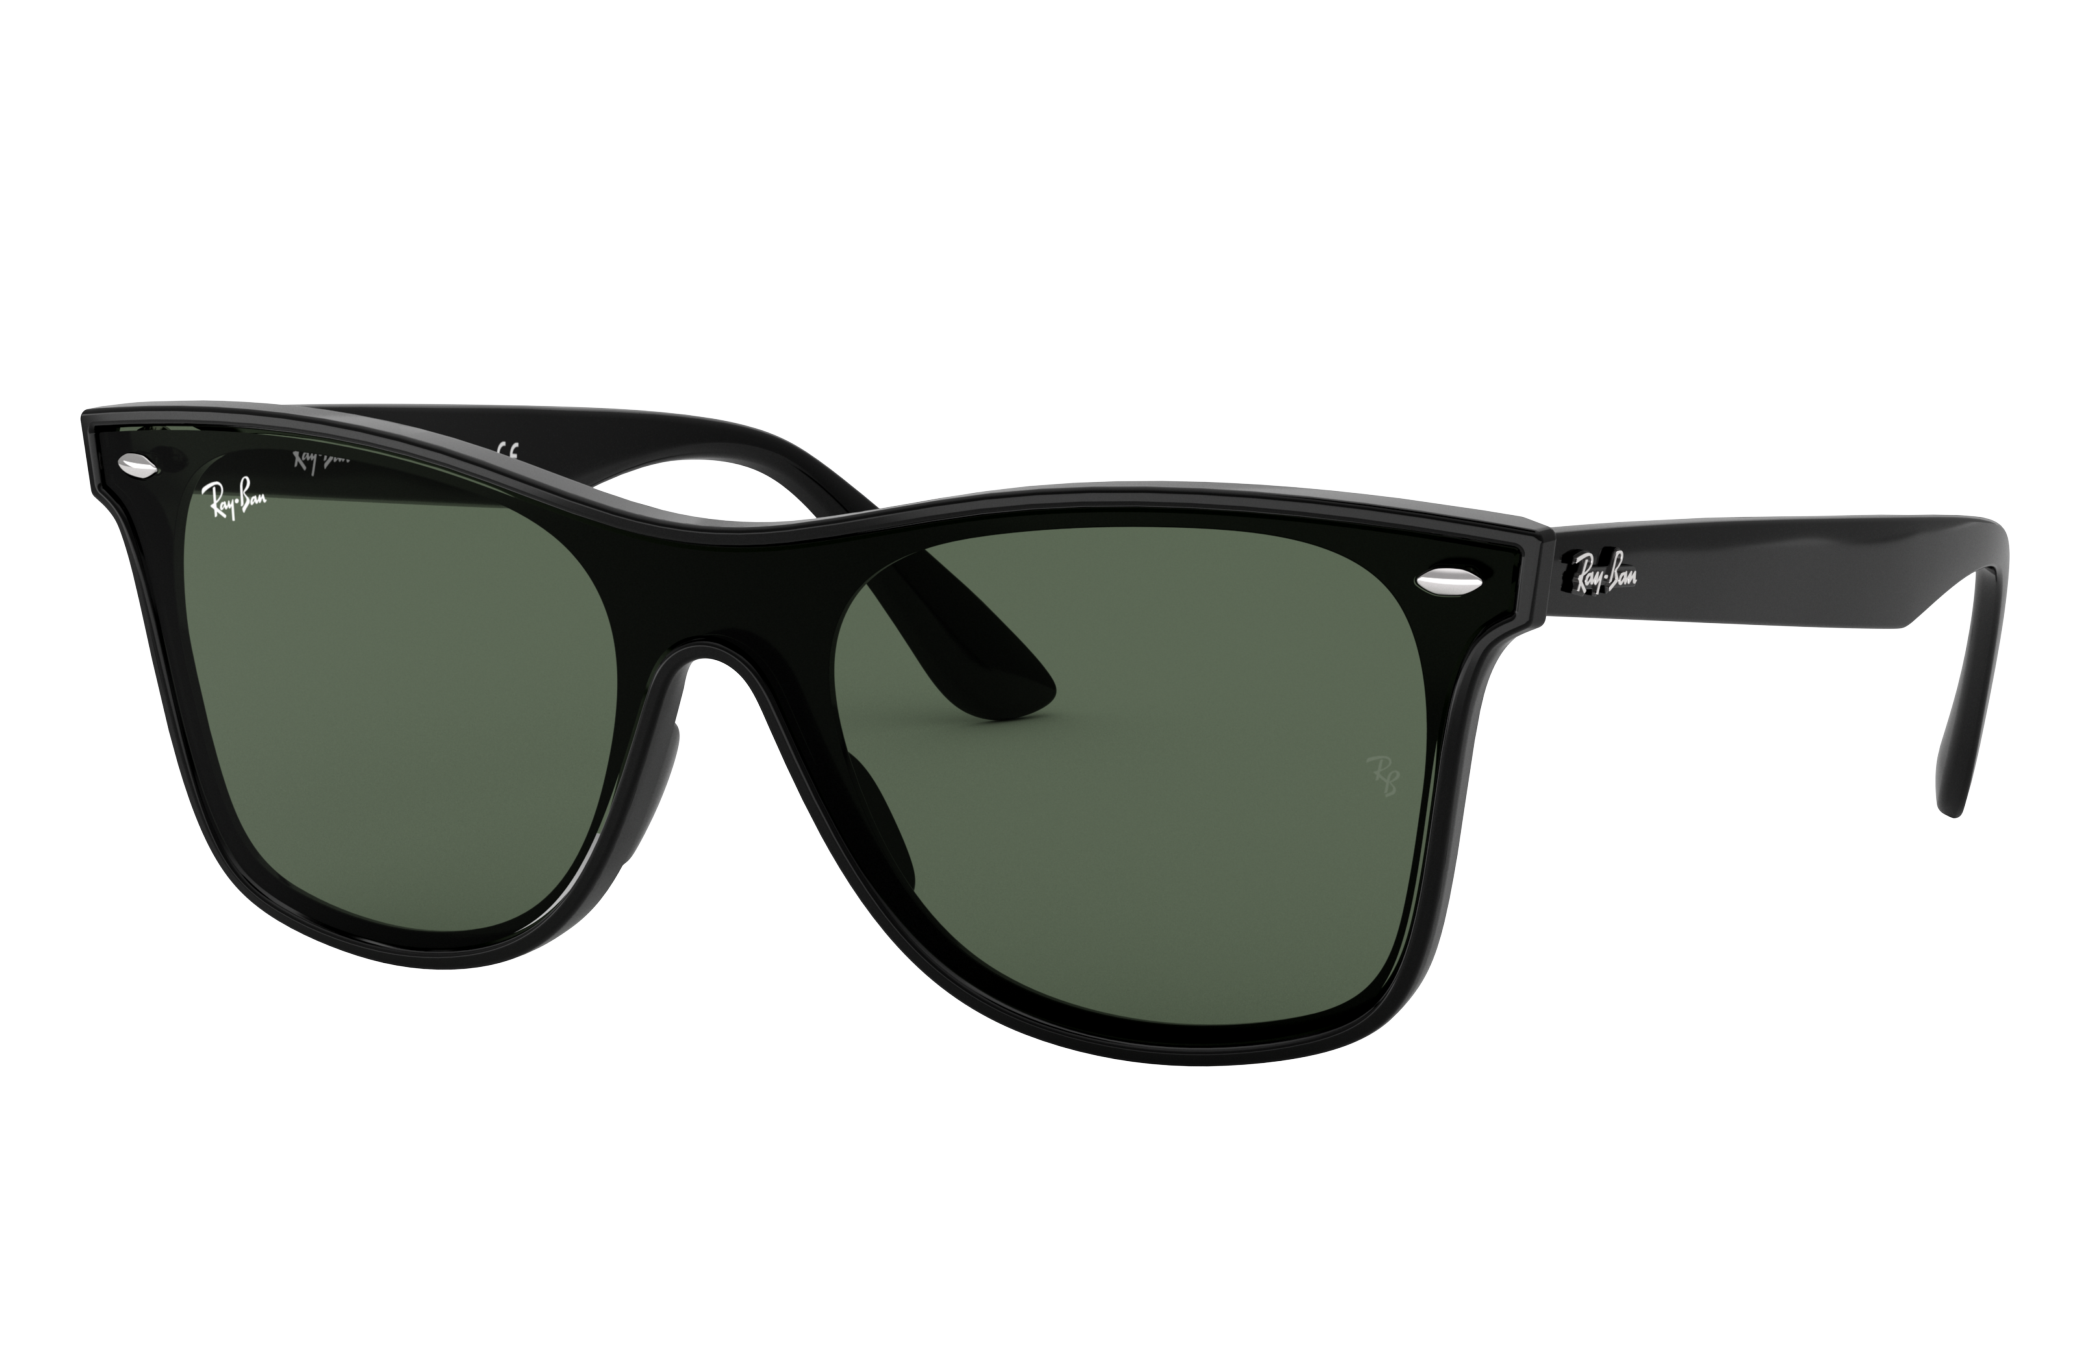 Ray-Ban Blaze Wayfarer Black, Green Lenses - RB4440N